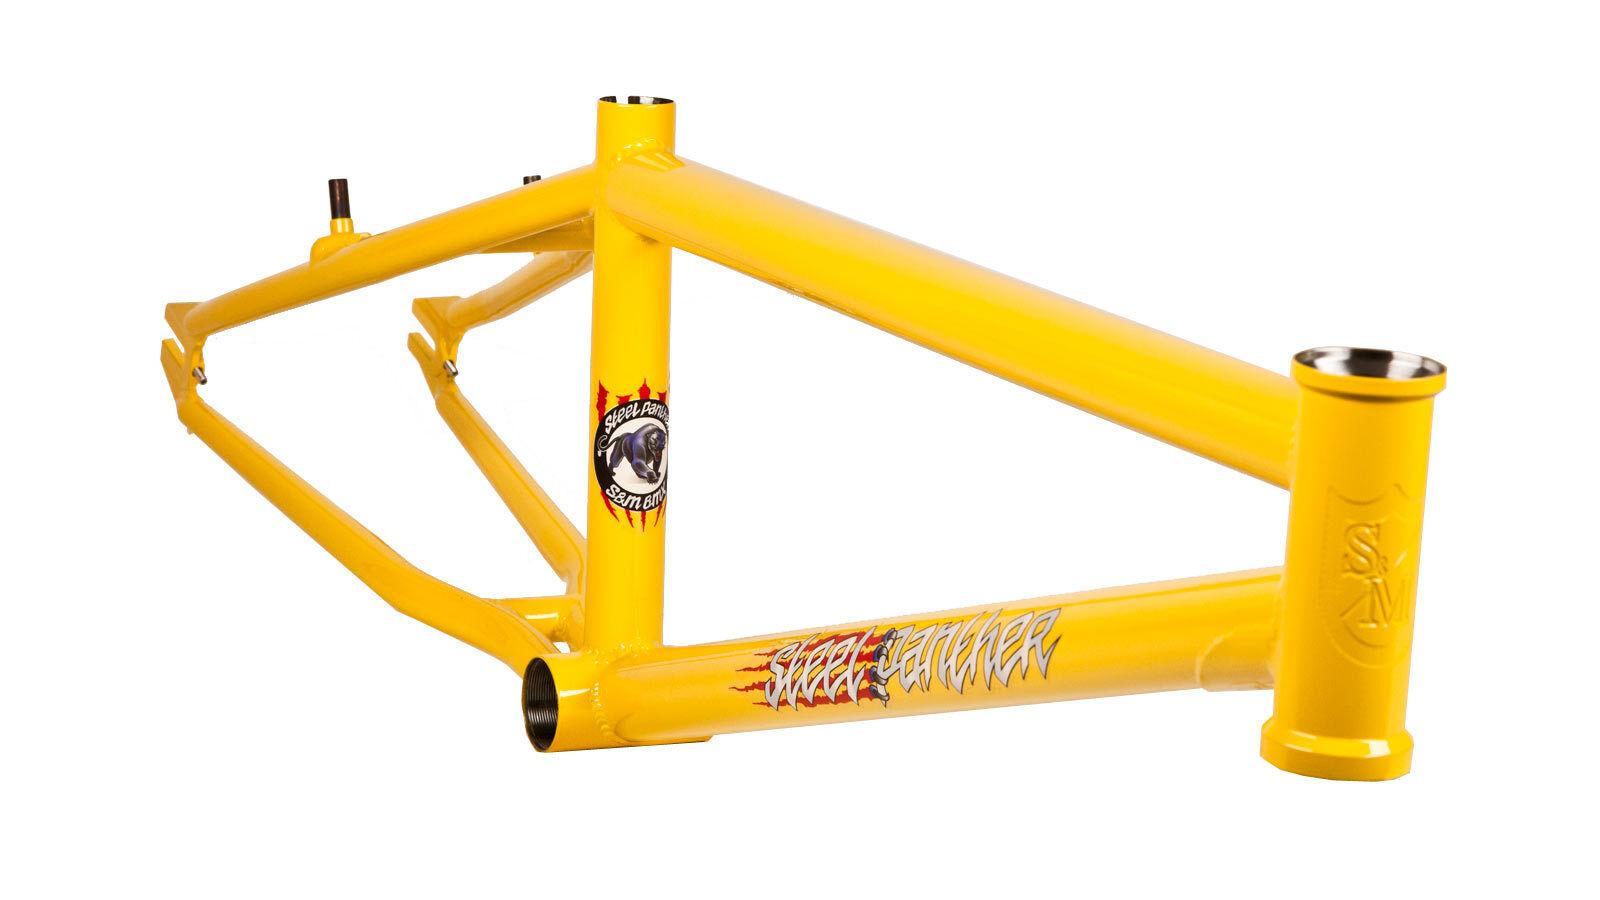 S&M BIKES STEEL PANTHER RACE FRAME giallo 21 BMX 20 BIKE 21 SPEEDWAGON RACING